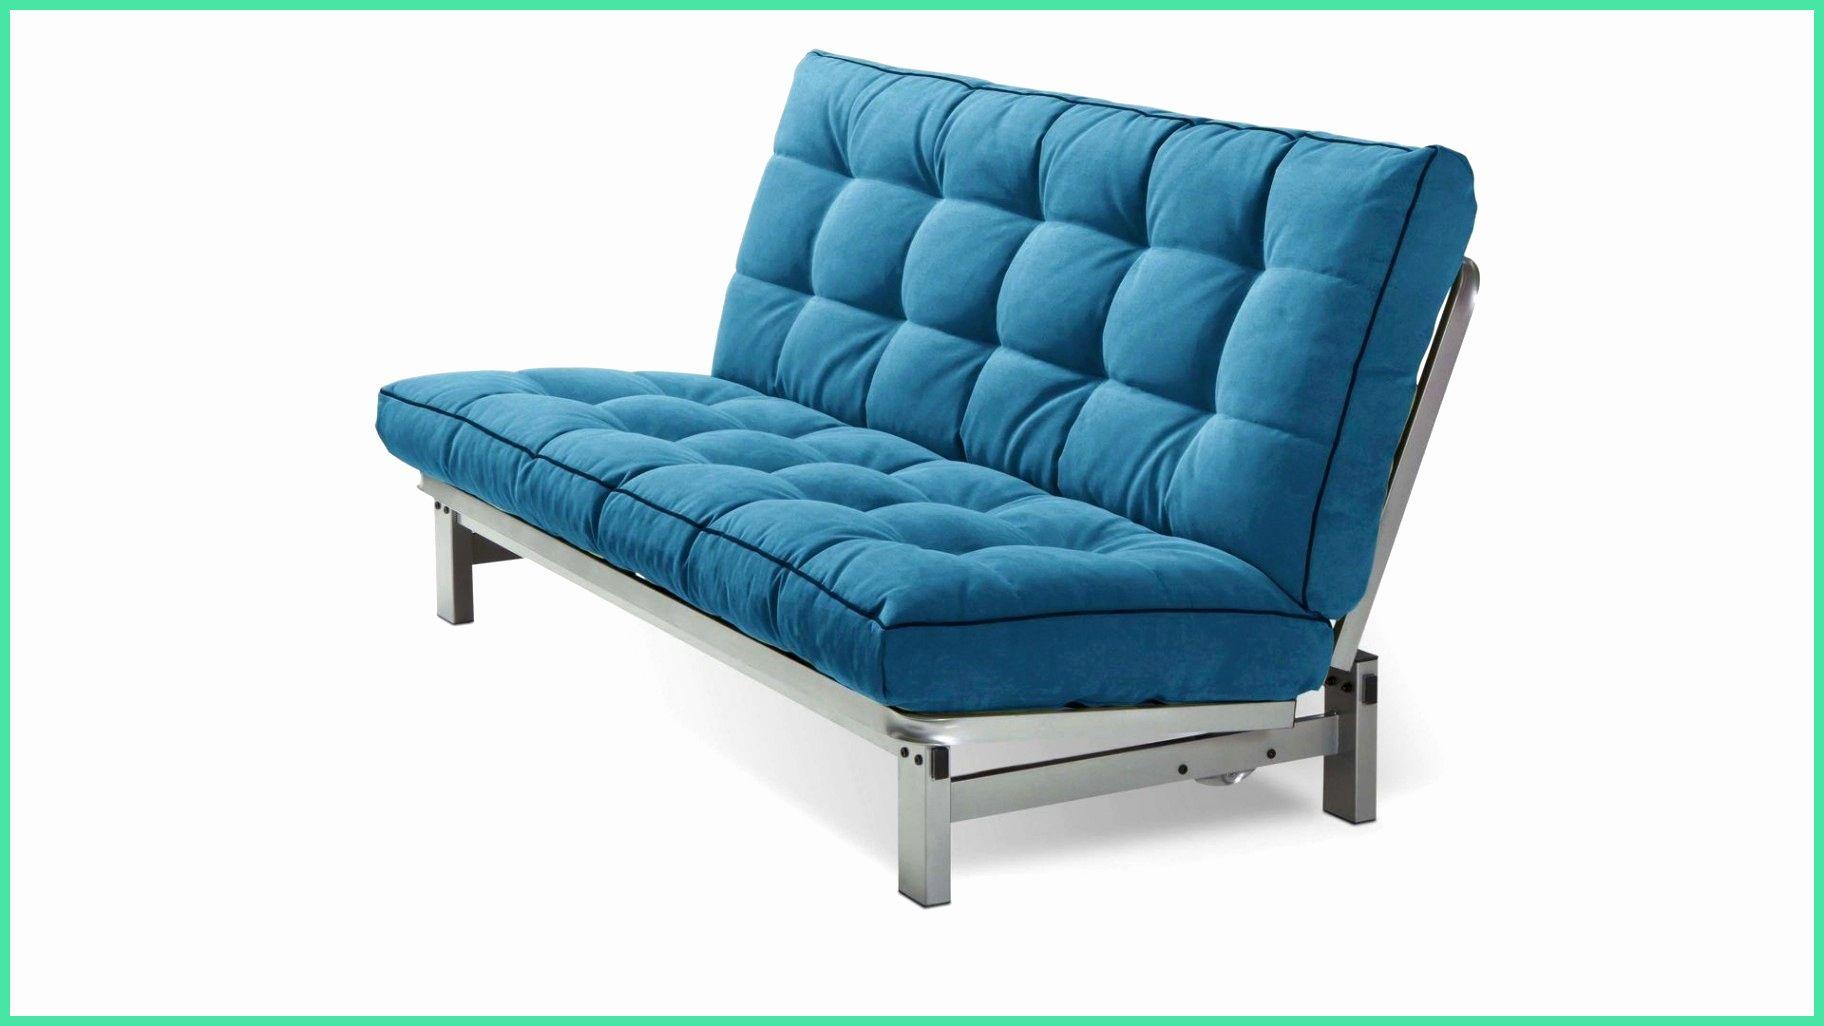 17 Extraordinay Schlafsofa 120 Cm Breit In 2020 Home Decor Furniture Couch